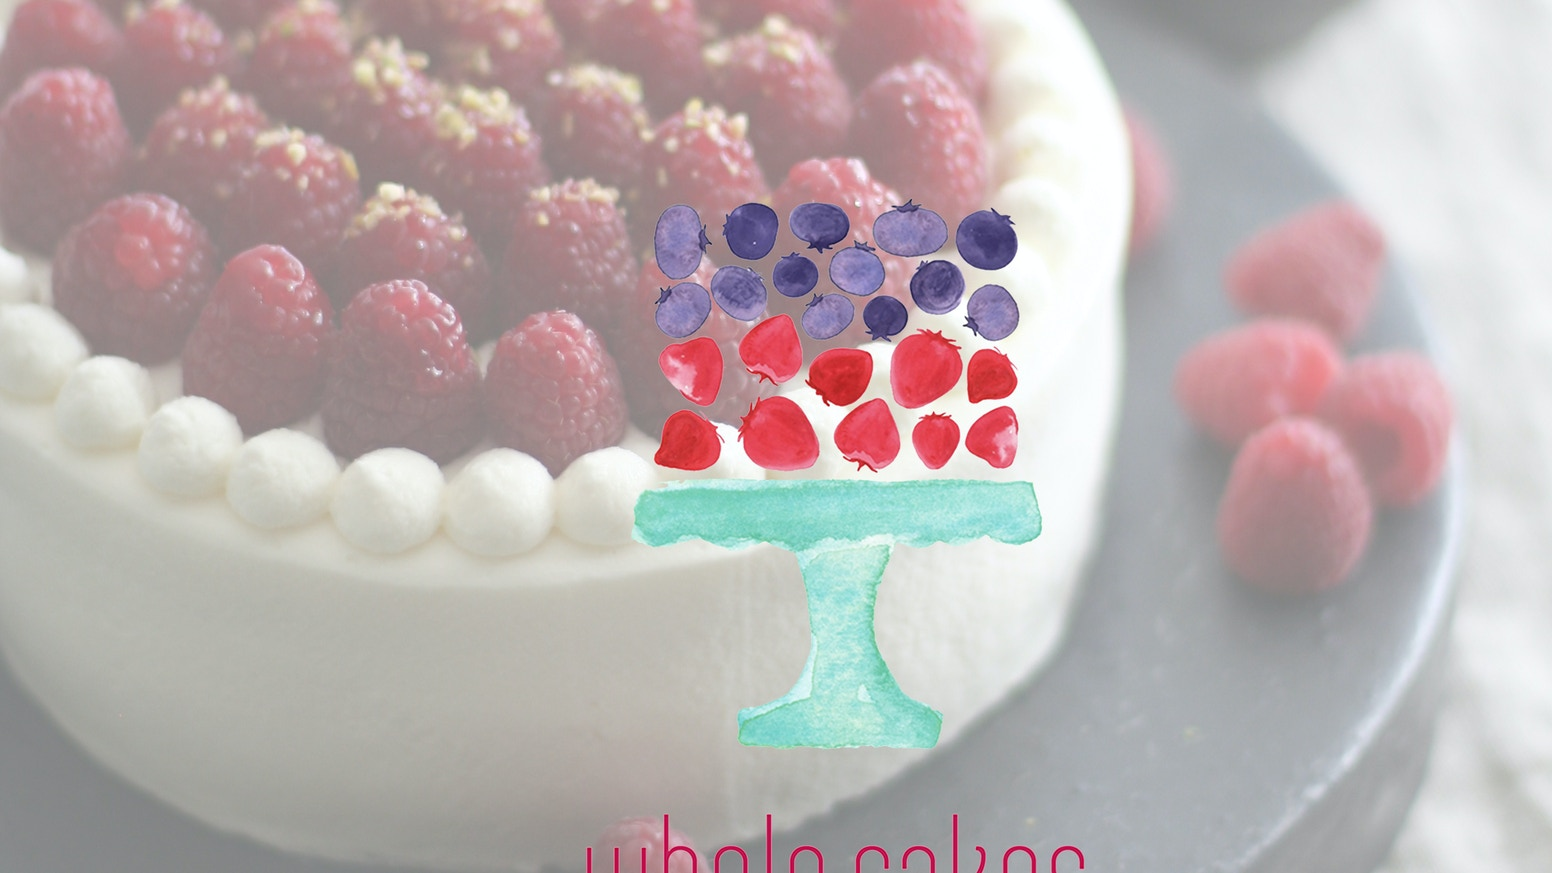 Whole Cakes San Francisco Store Front Launch By Sonya Kim Kickstarter